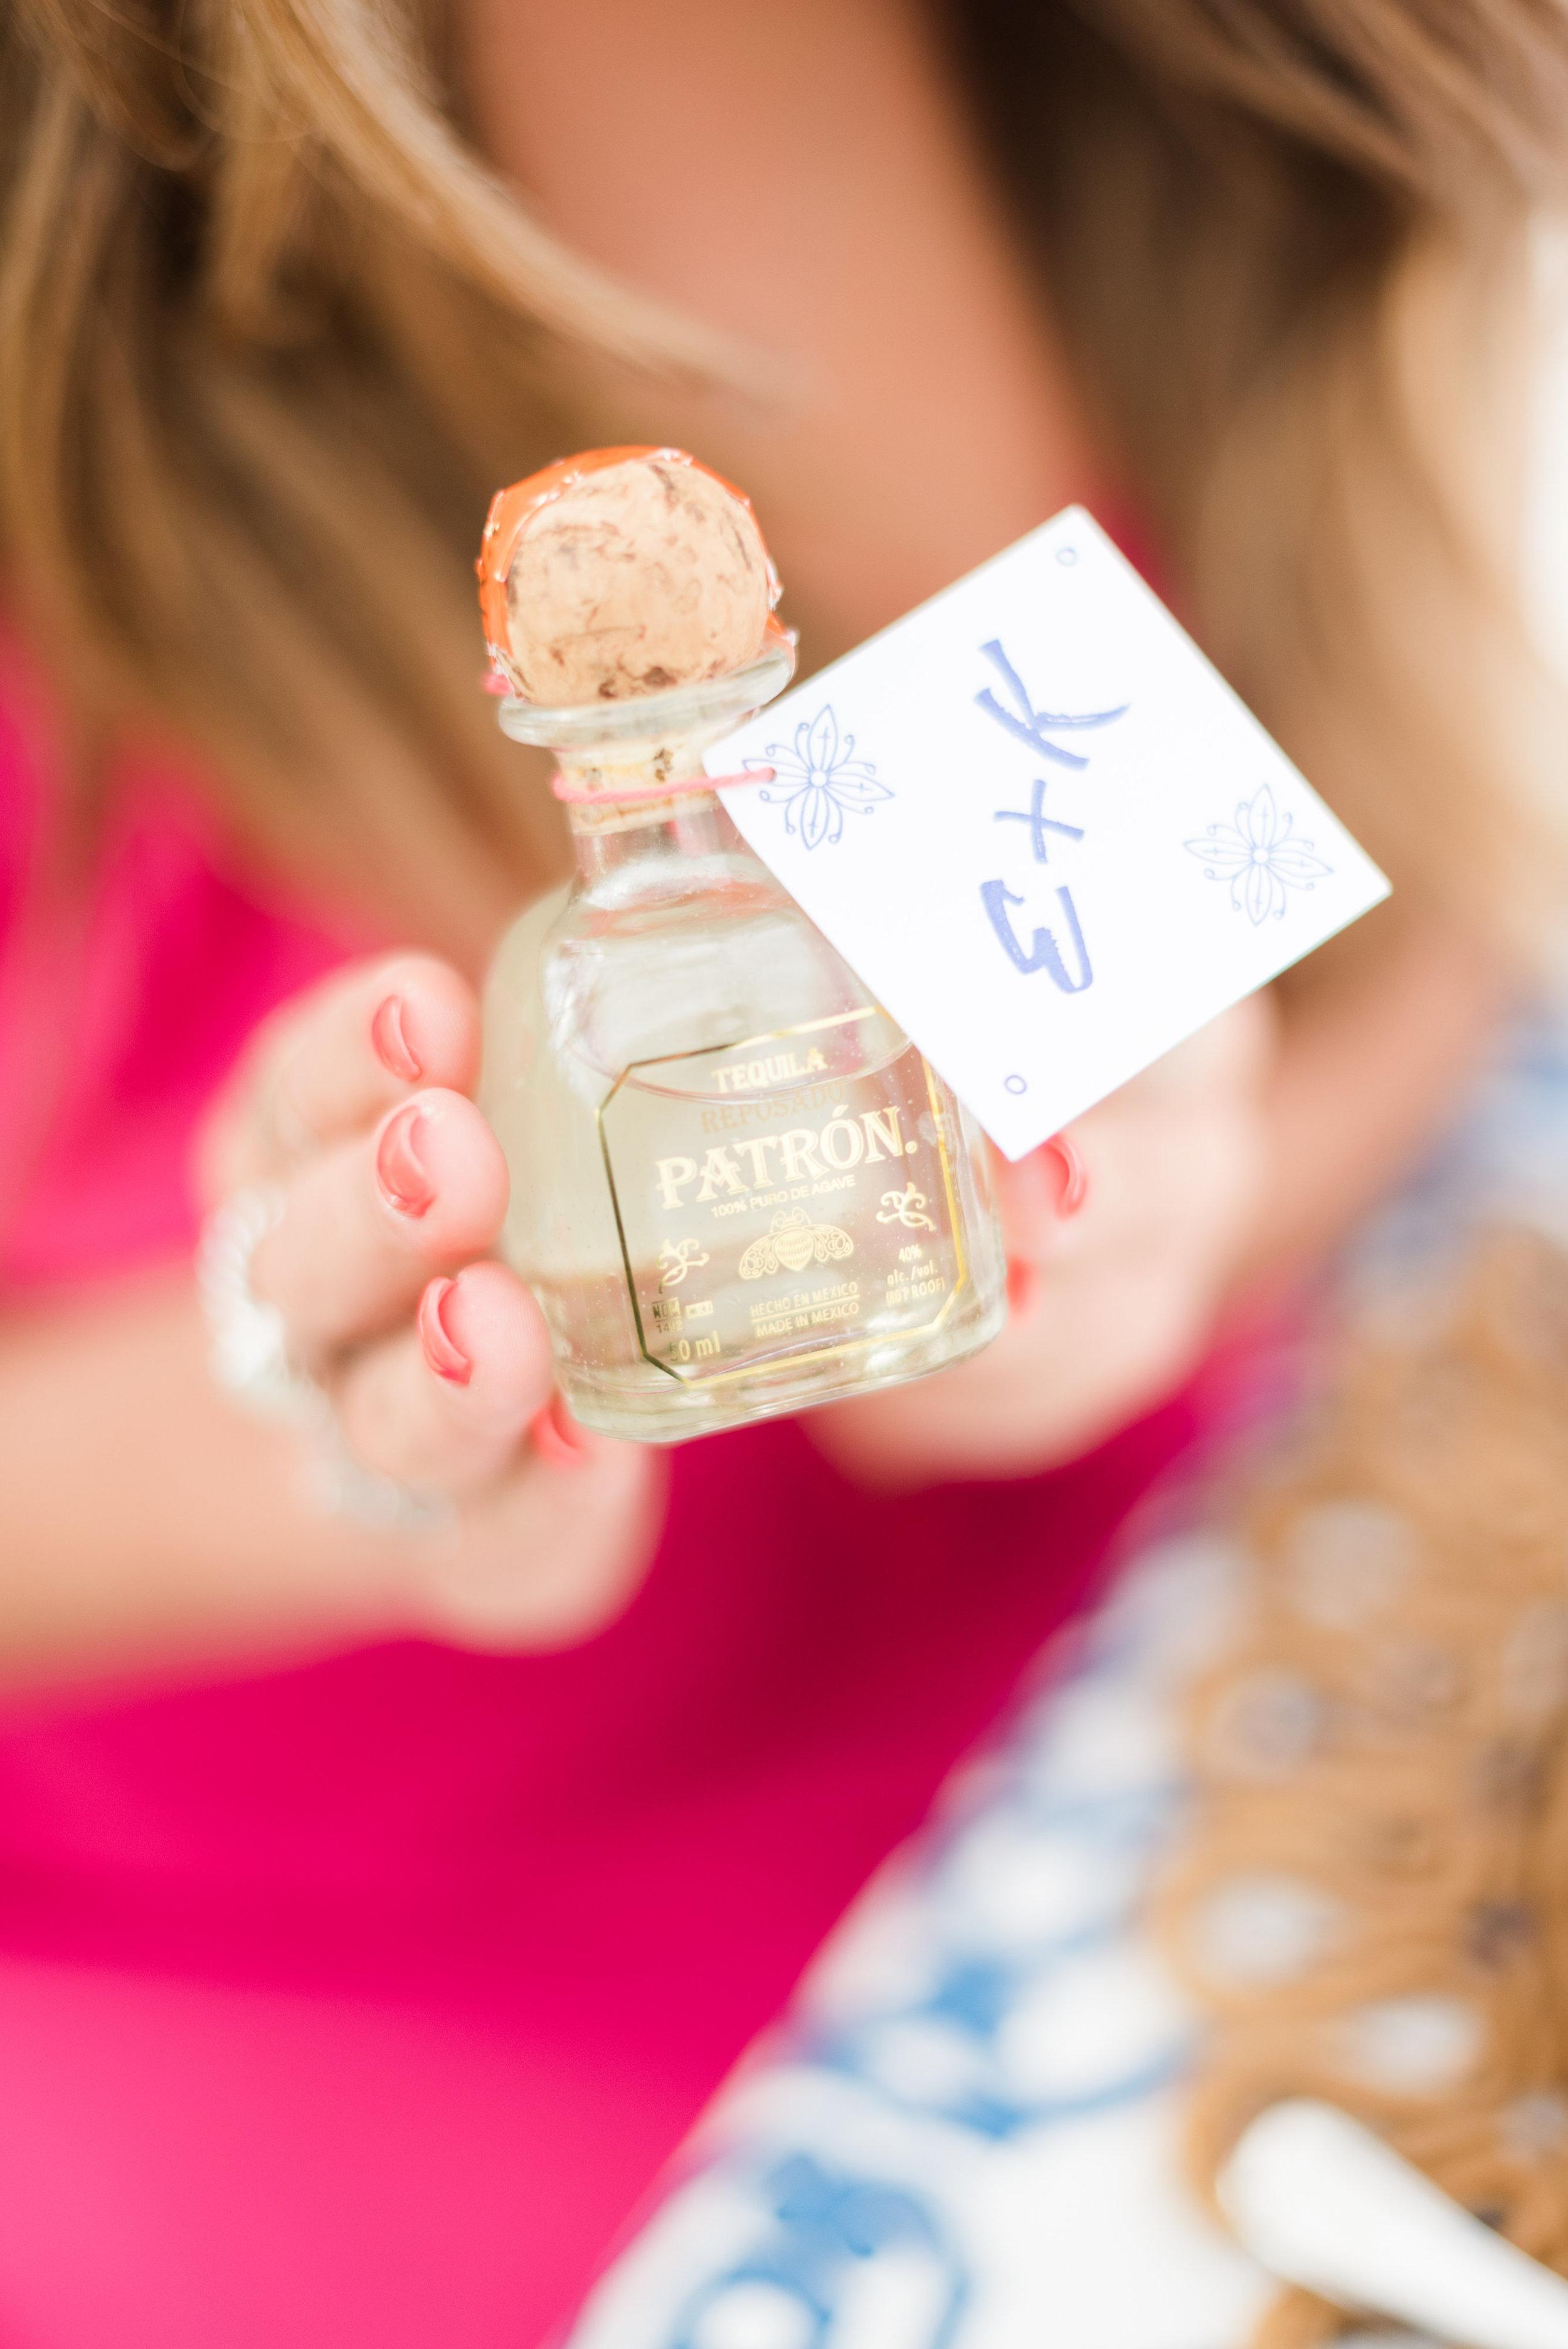 Fiesta-Party-Inspiration-by-Event-Prep-Cassandra-Clair-Photograpy-Amanda-Collins-72.jpg